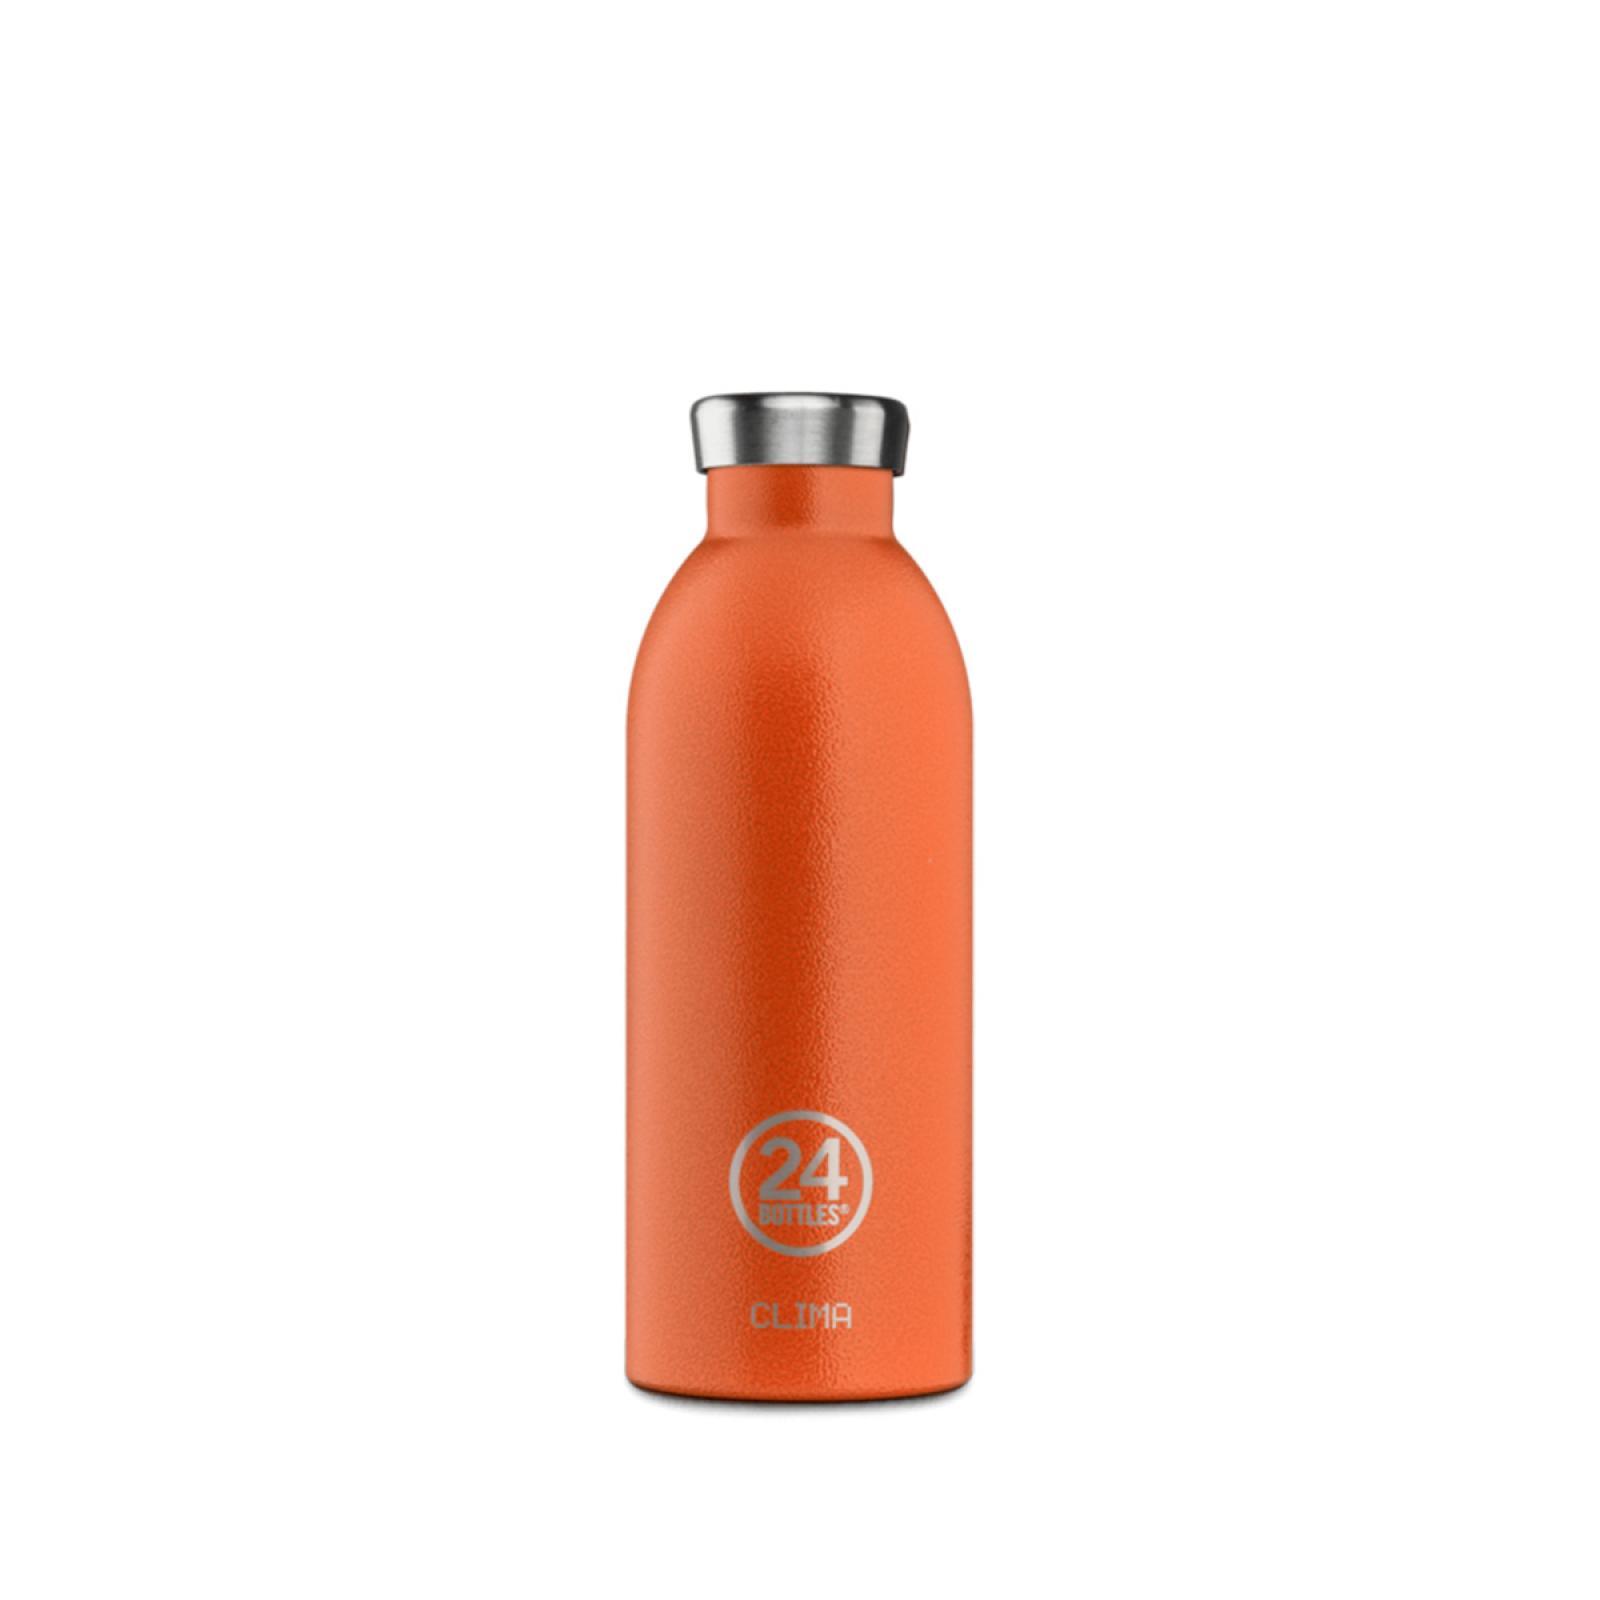 24 Bottles Clima Bottle Sunset Orange 500 ml - 1